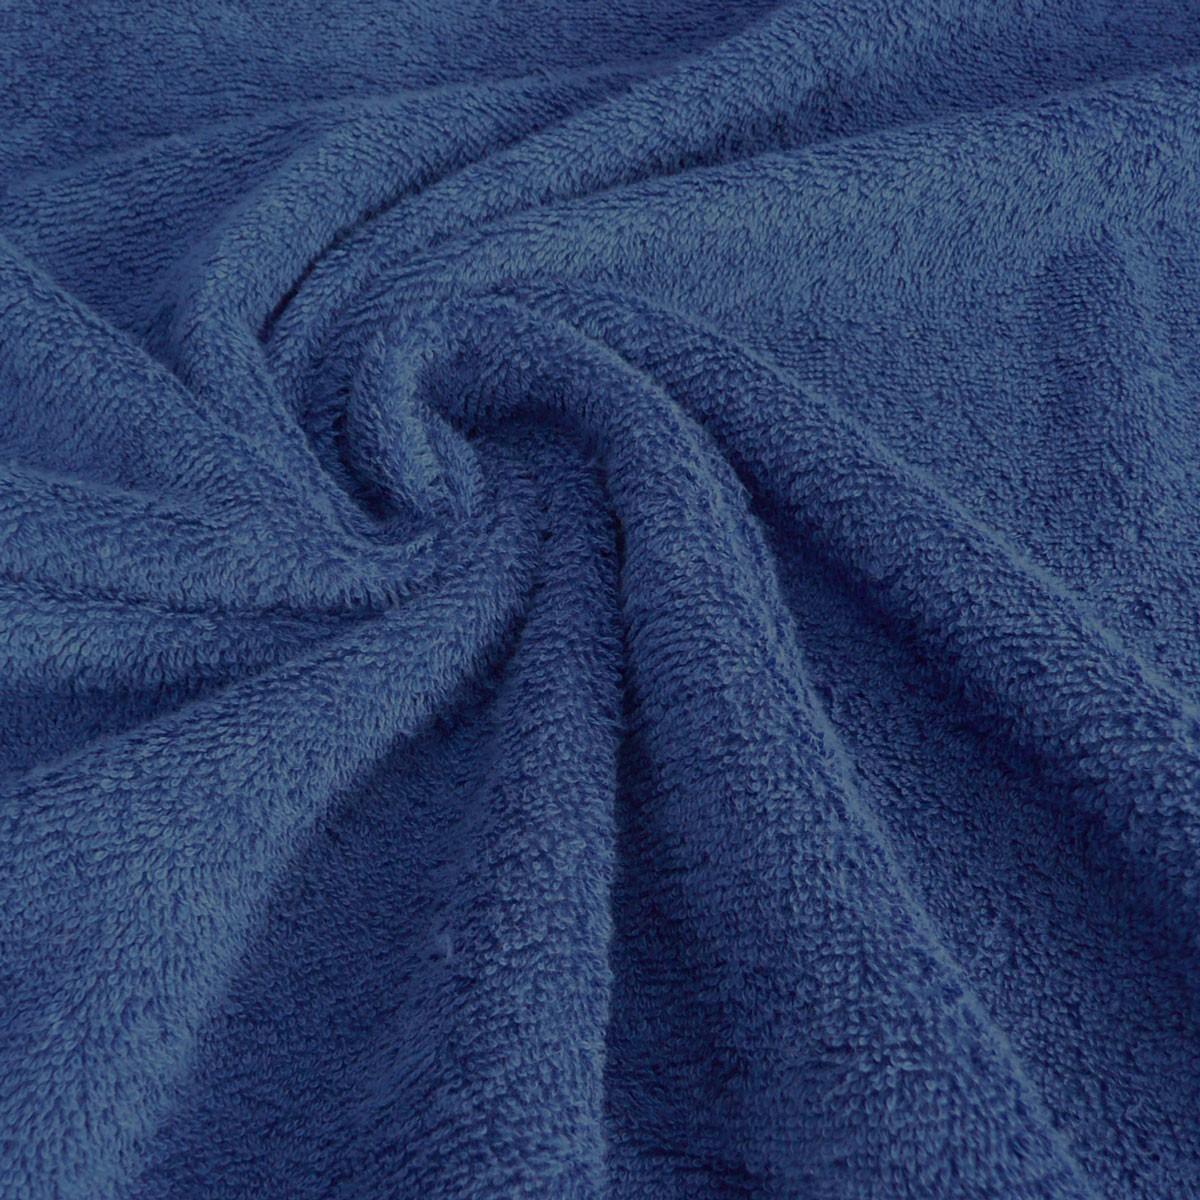 frottee handtuch stoff meterware dunkelblau ebay. Black Bedroom Furniture Sets. Home Design Ideas